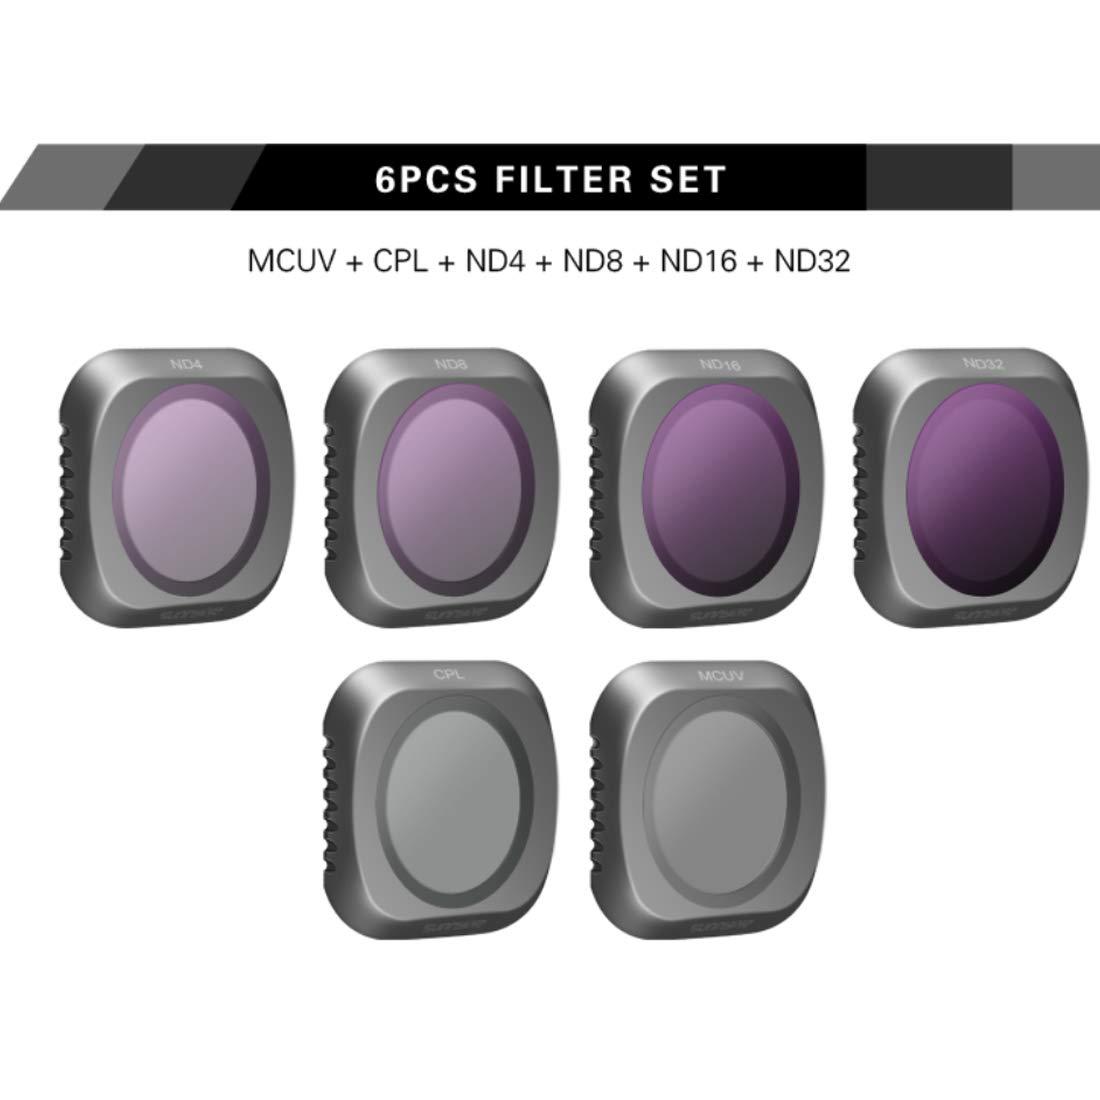 LoKauf 6St. Drone Filterset für DJI Mavic 2 PRO PRO PRO - MCUV CPL ND4 ND8 ND16 ND32 Filter 800f61